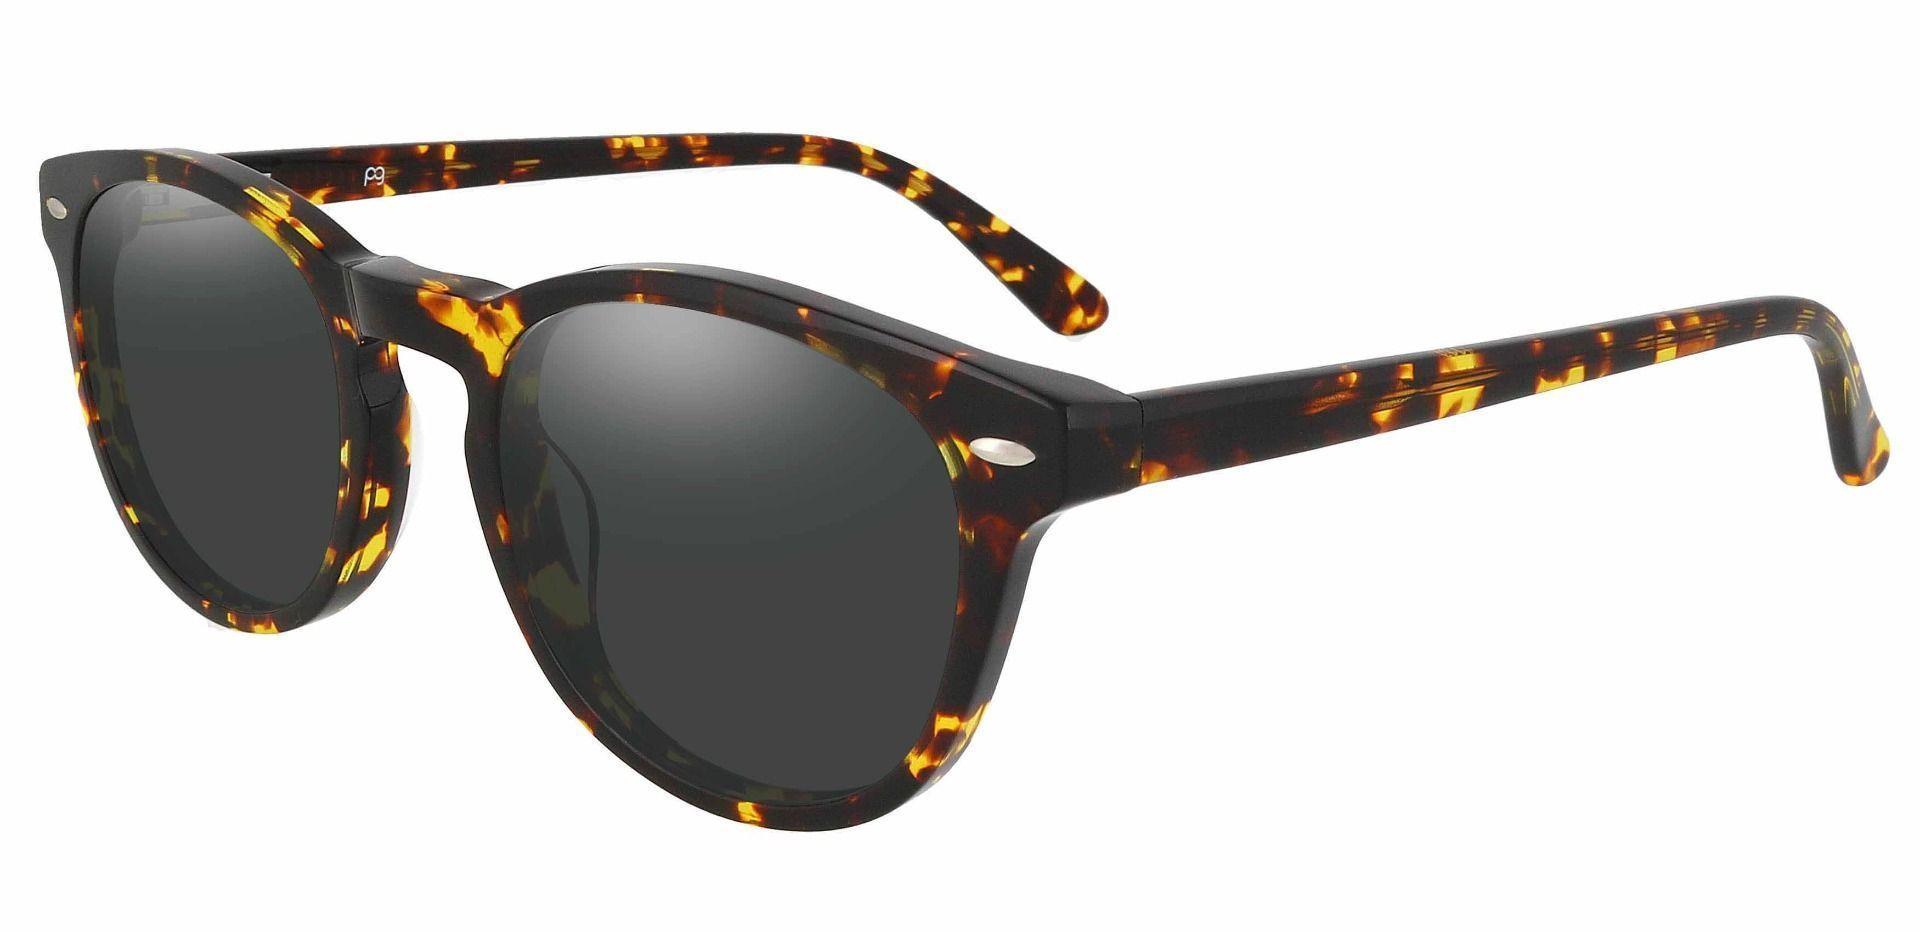 Laguna Oval Lined Bifocal Sunglasses - Tortoise Frame With Gray Lenses